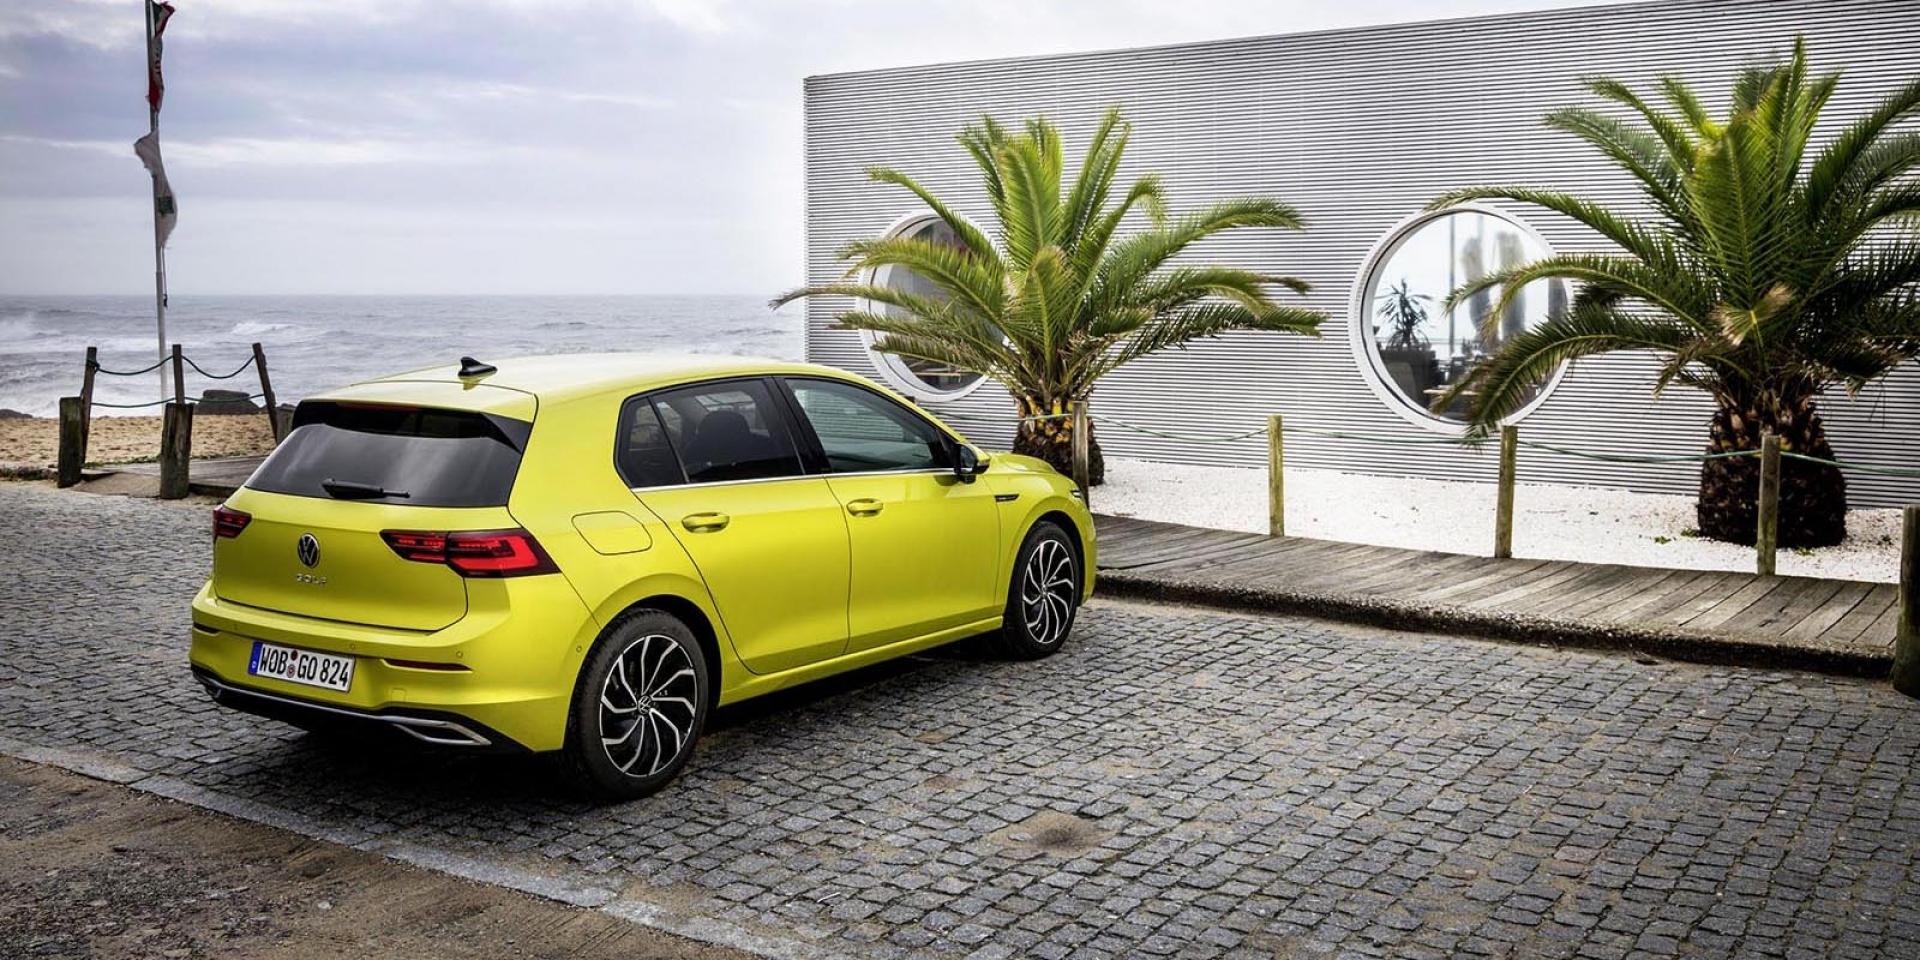 VW Golf GTI日內瓦車展即將登場,馬力數據提前流出?